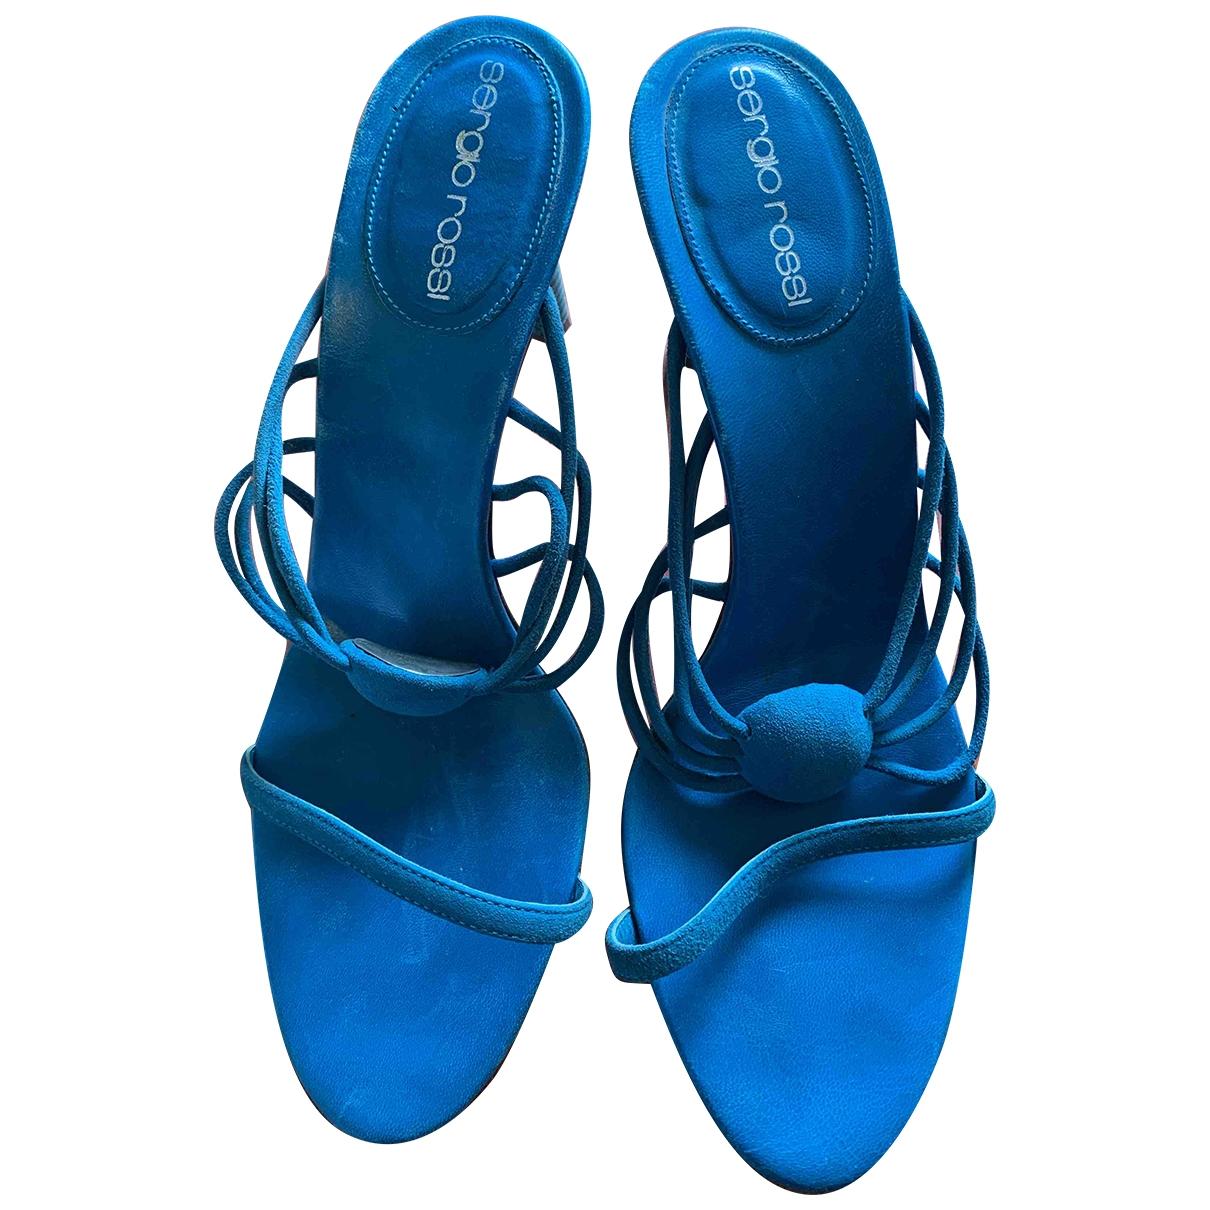 Sergio Rossi - Sandales   pour femme en cuir - turquoise